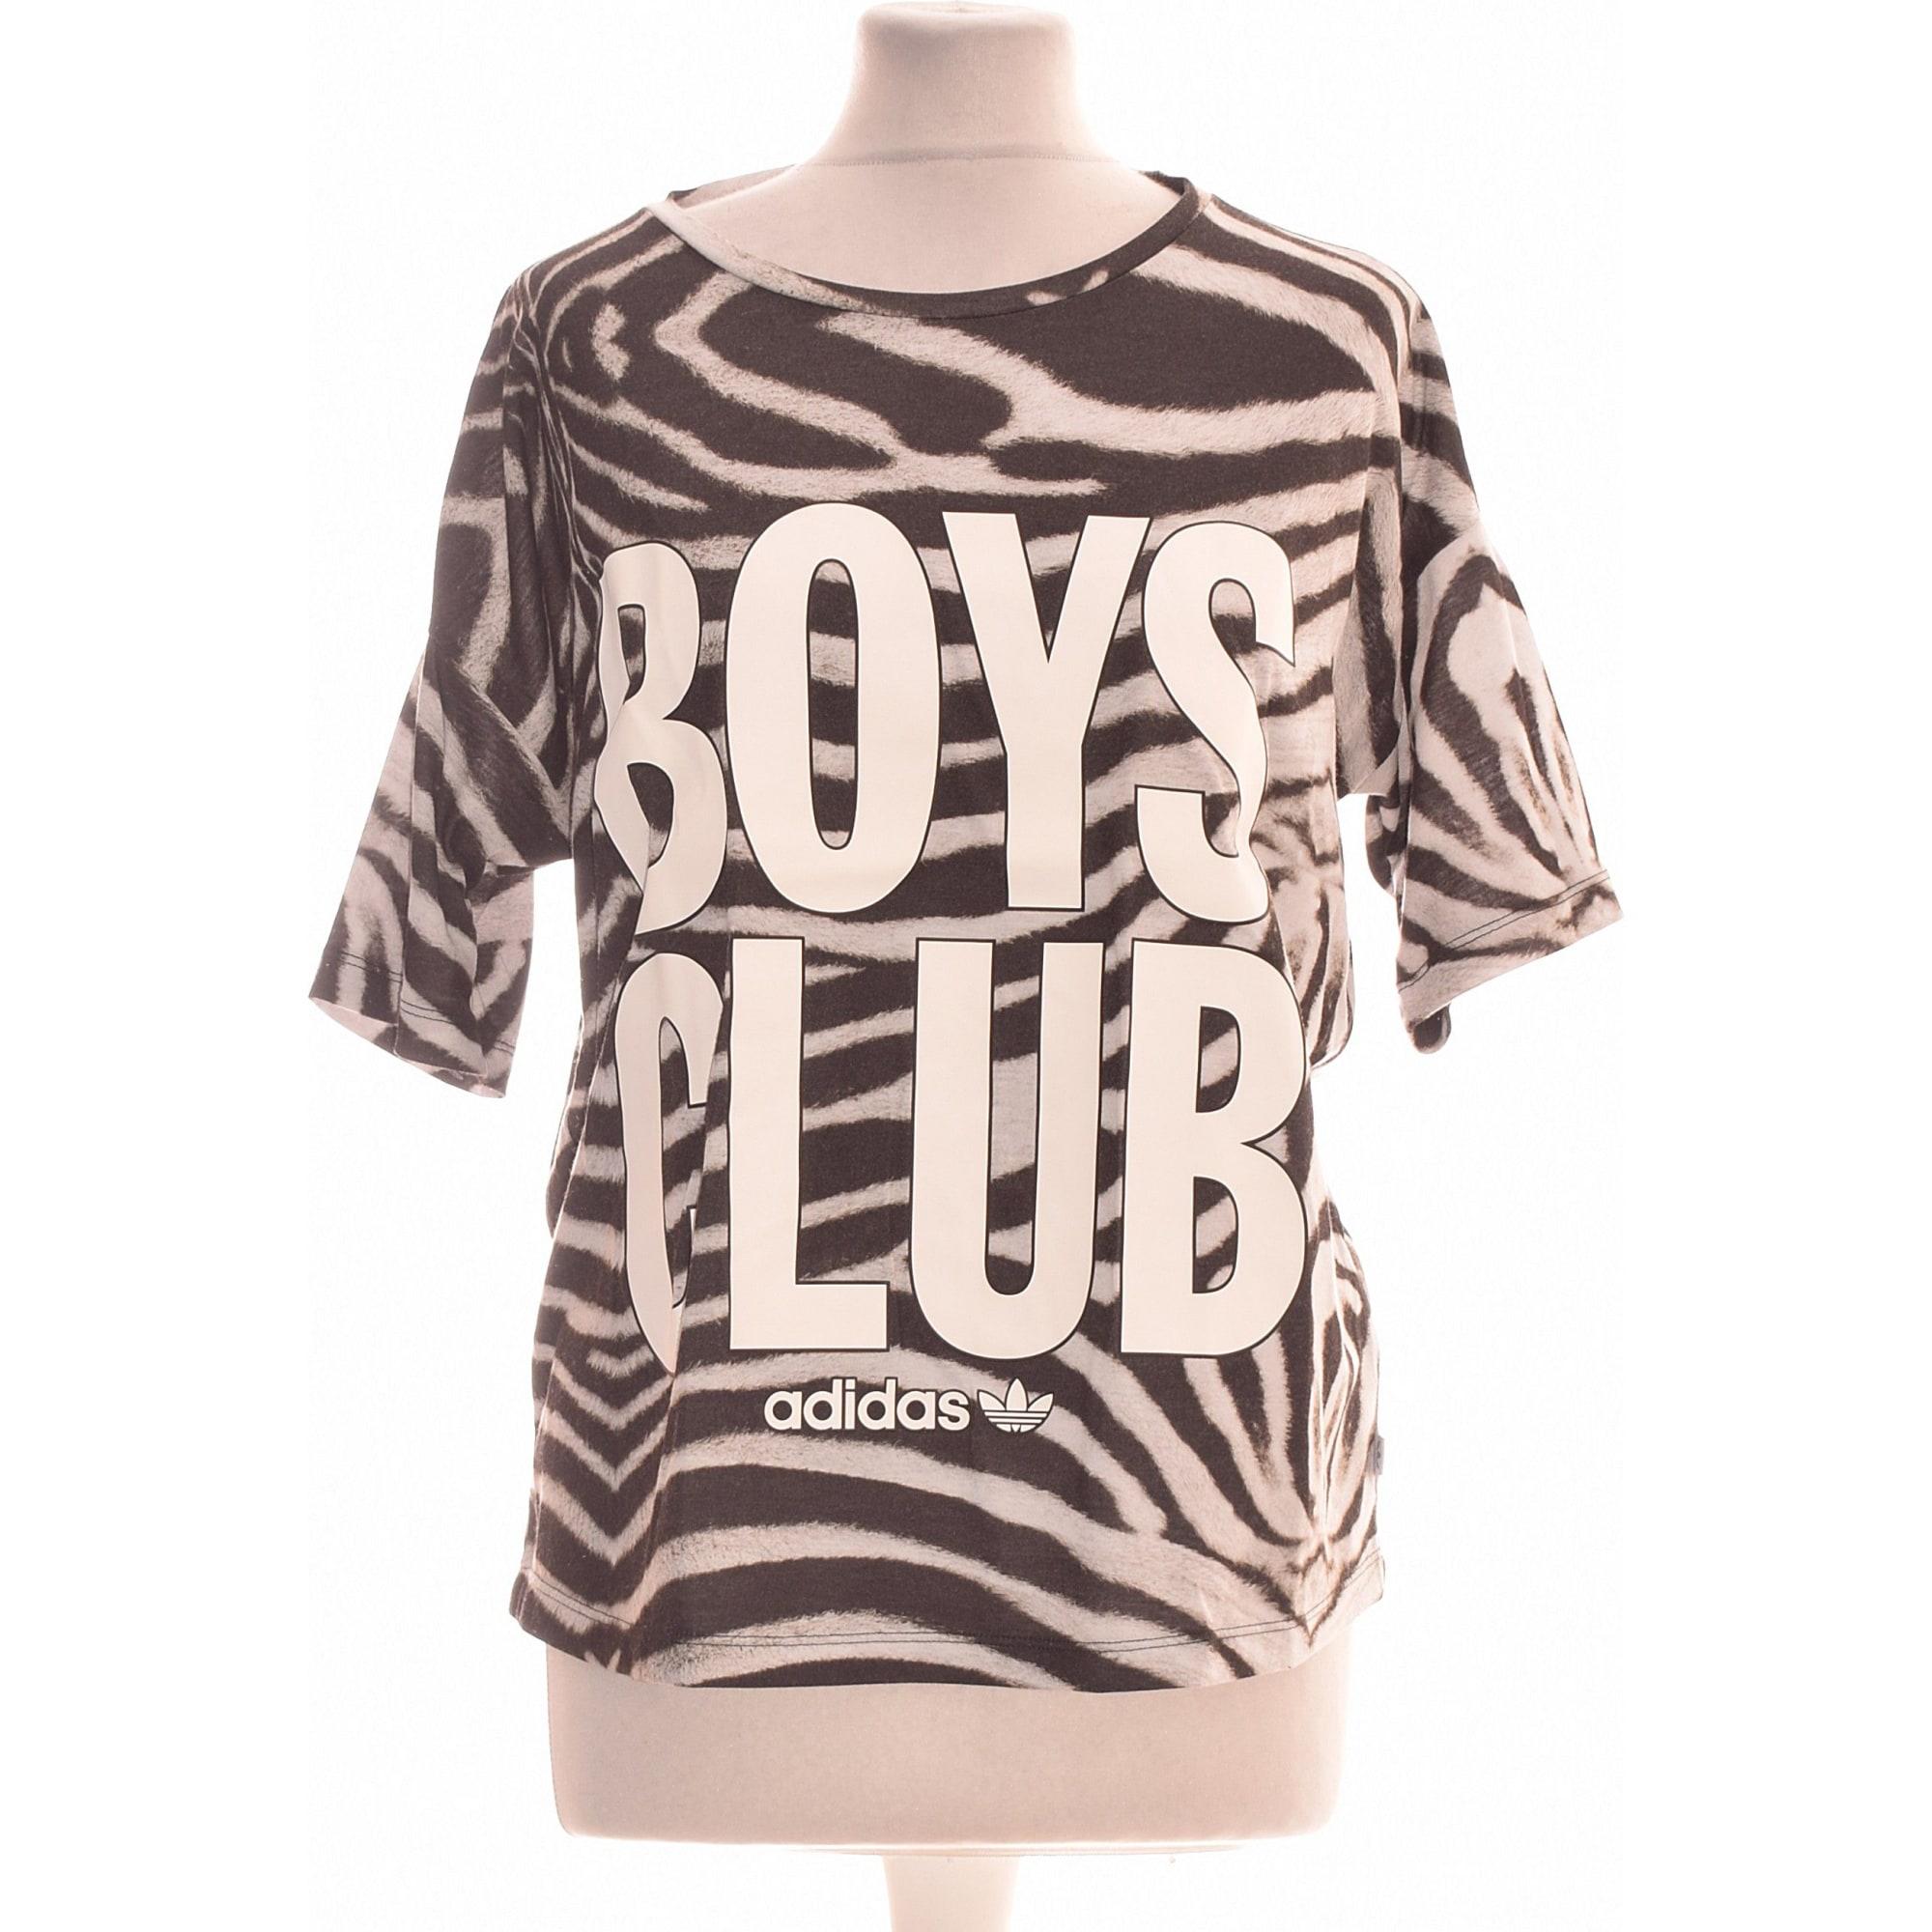 Tops, T-Shirt ADIDAS Grau, anthrazit